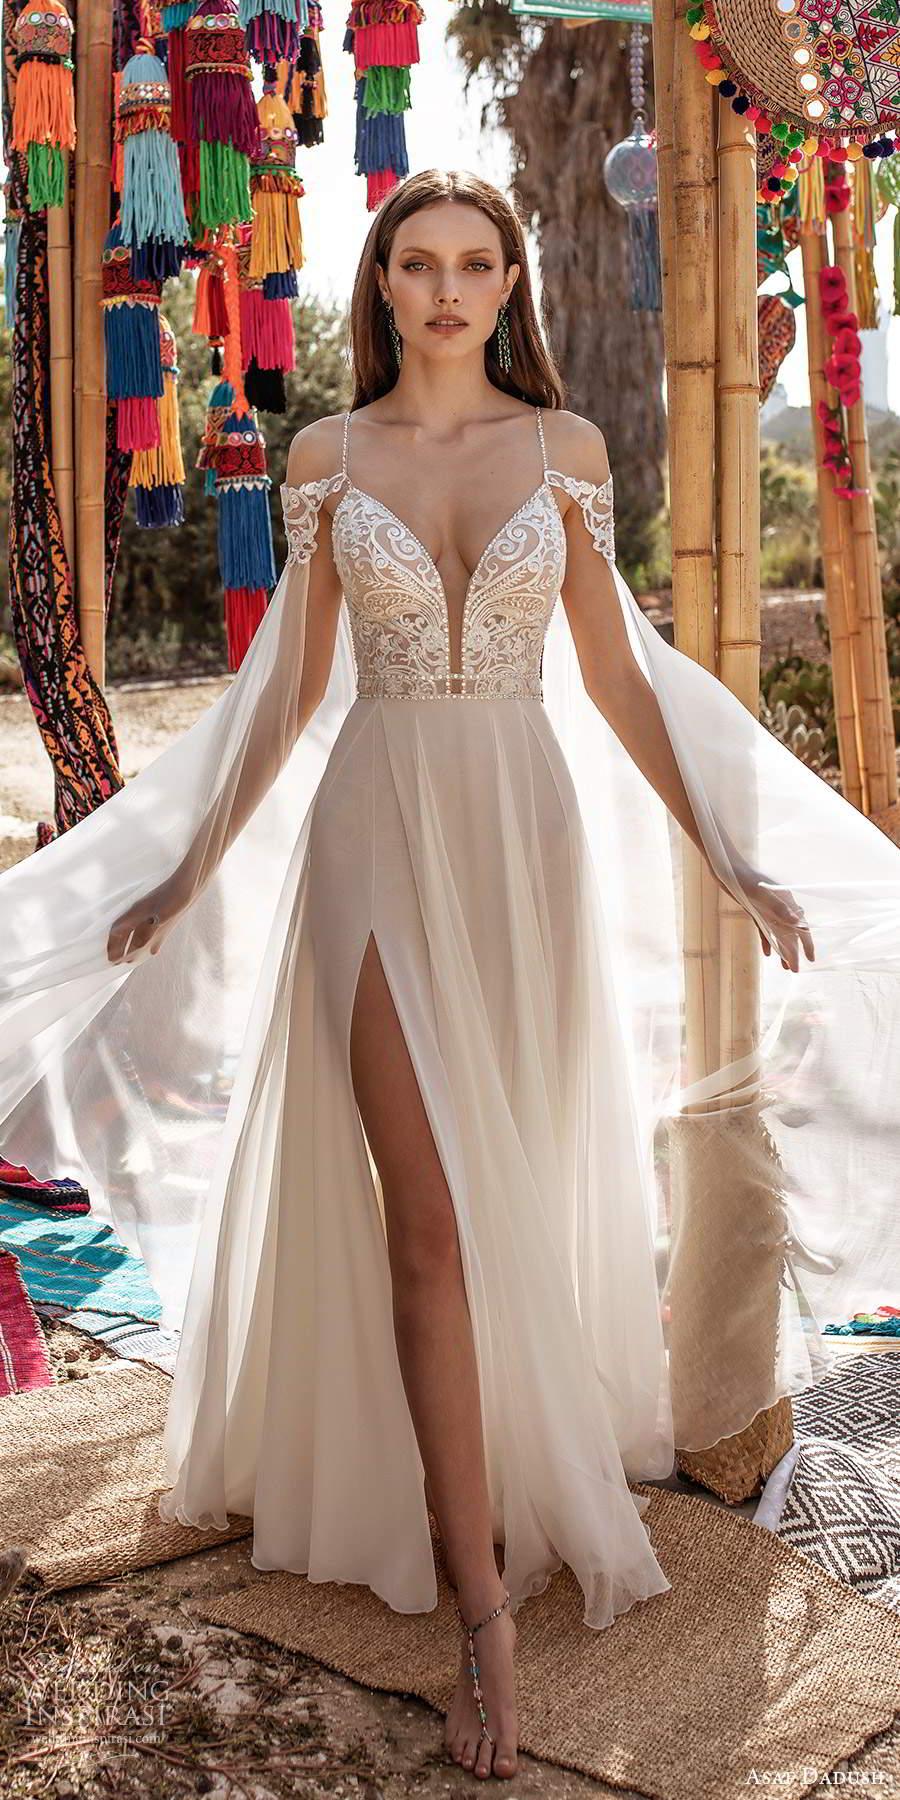 asaf dadush 2020 bridal sleeveless thin straps plunging v neckline heavily embellished bodice clean skirt a line wedding dress chapel train cape (1) mv